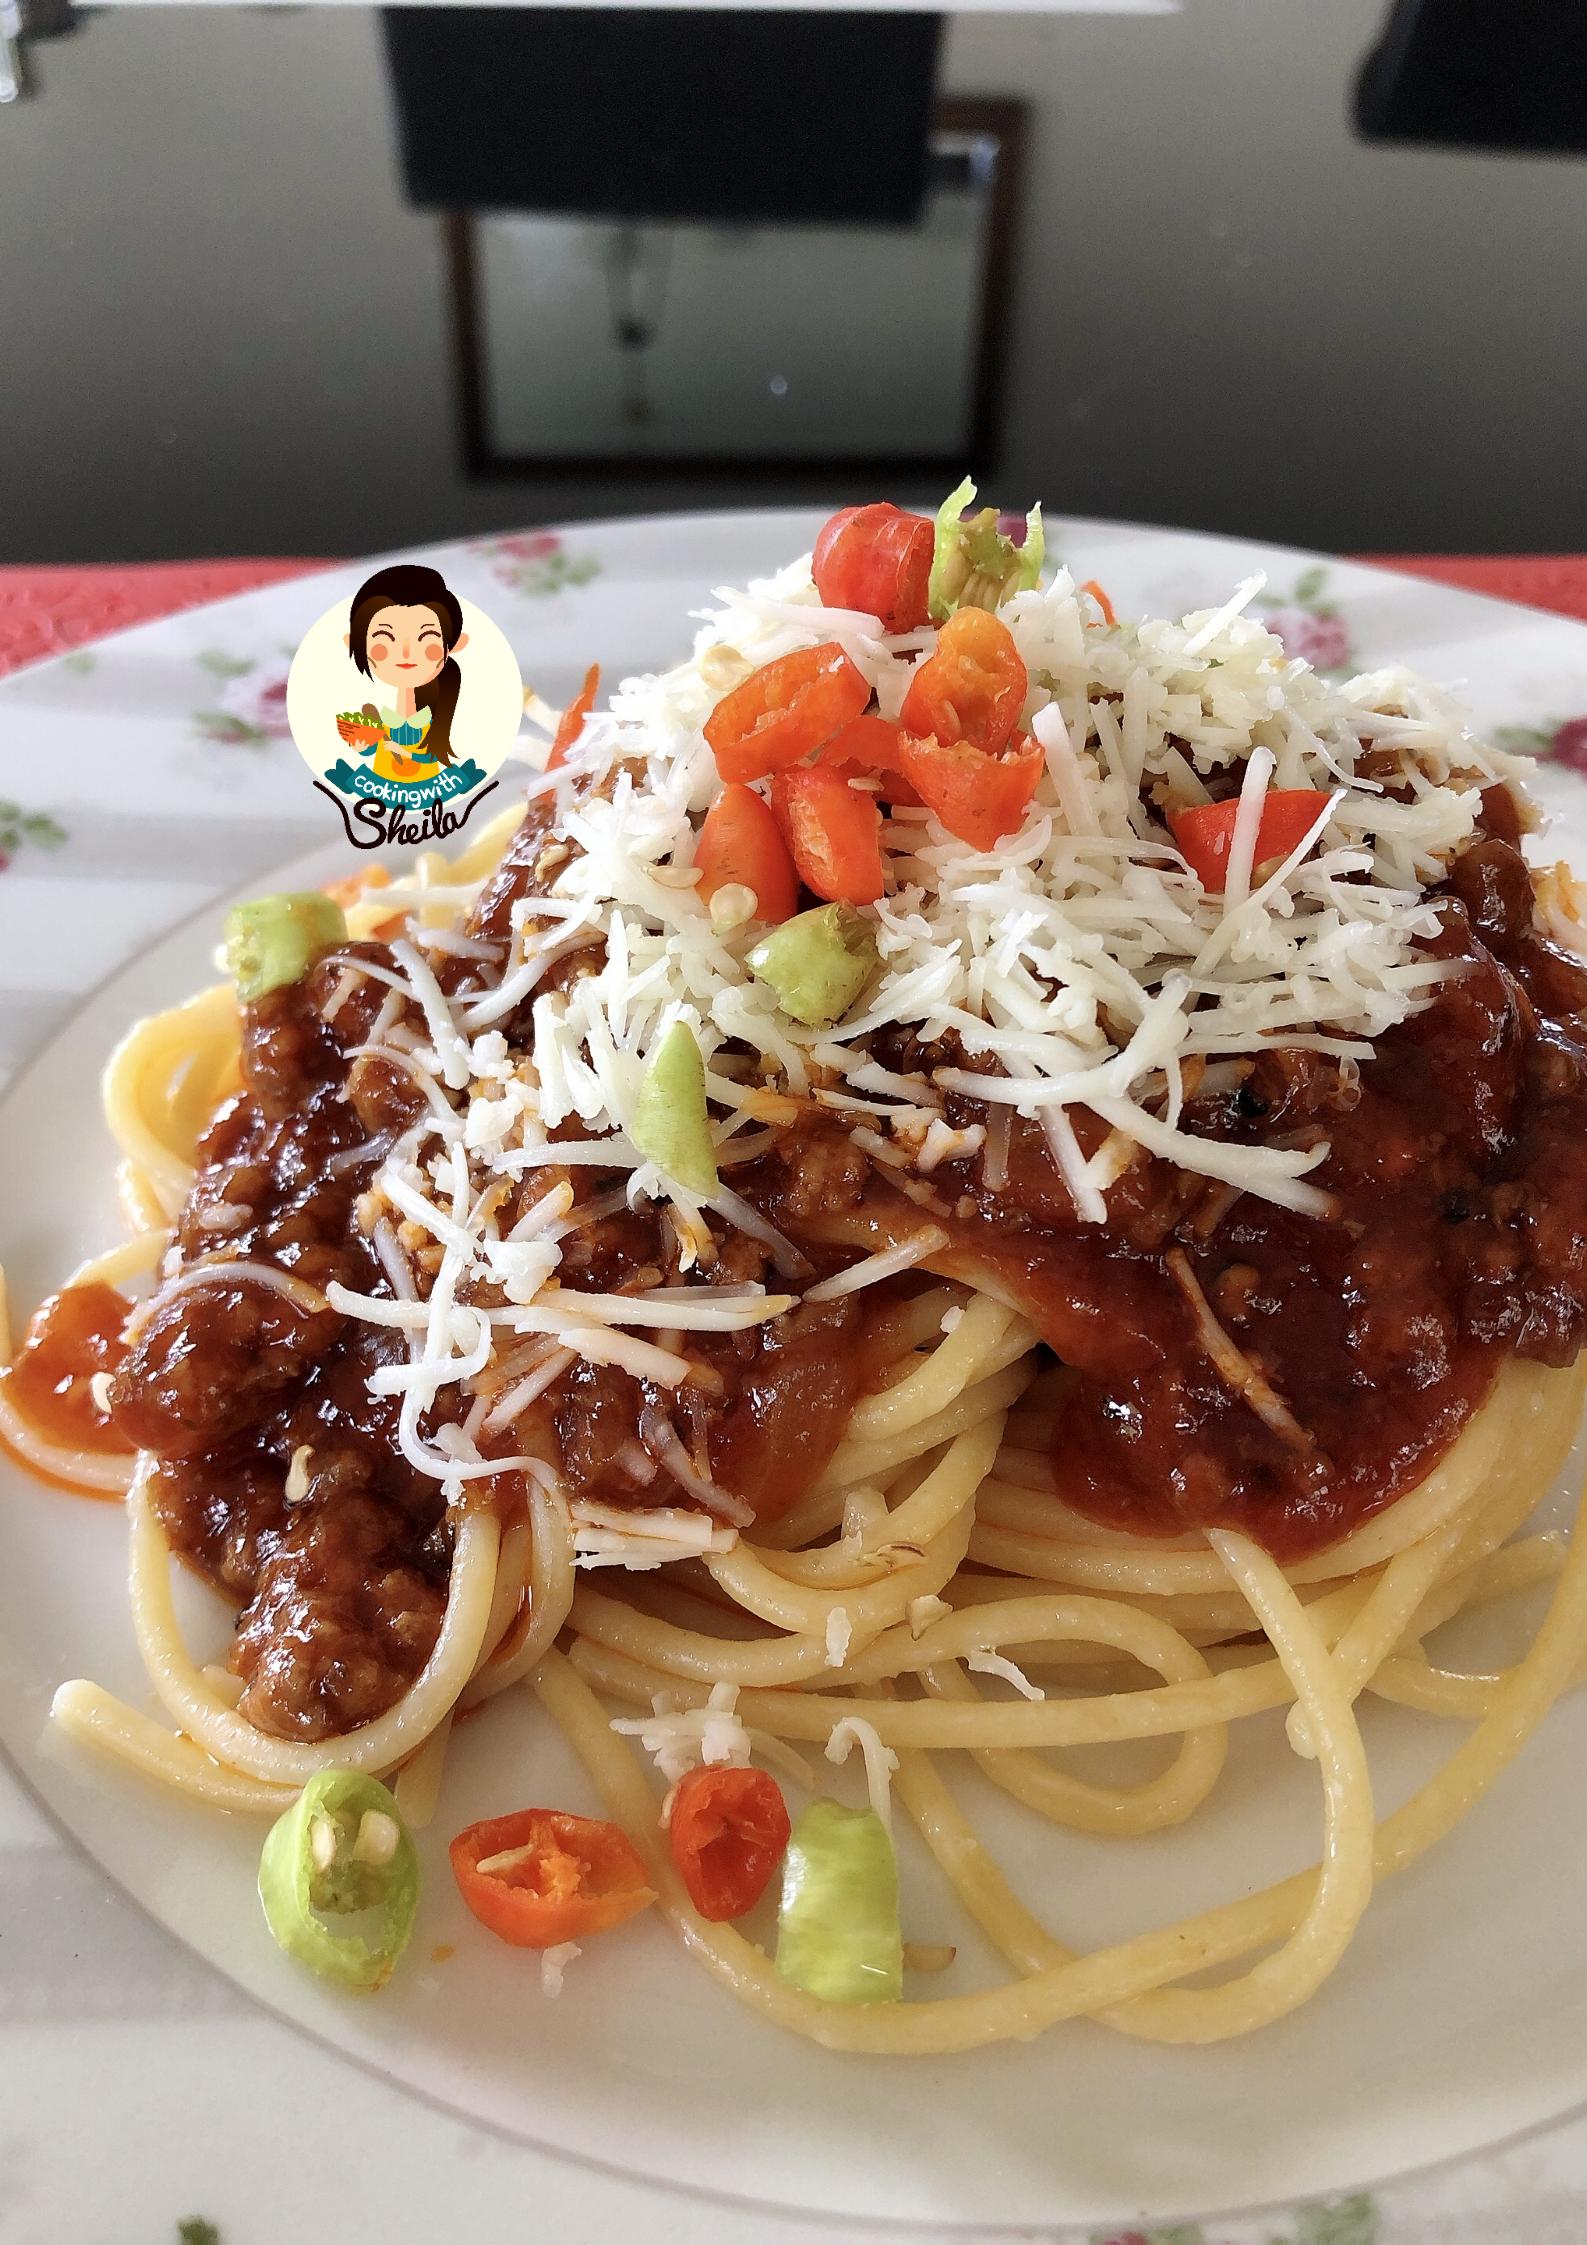 Spaghetti Bolognese Praktis Cooking With Sheila Di 2020 Makanan Daging Sapi Spaghetti